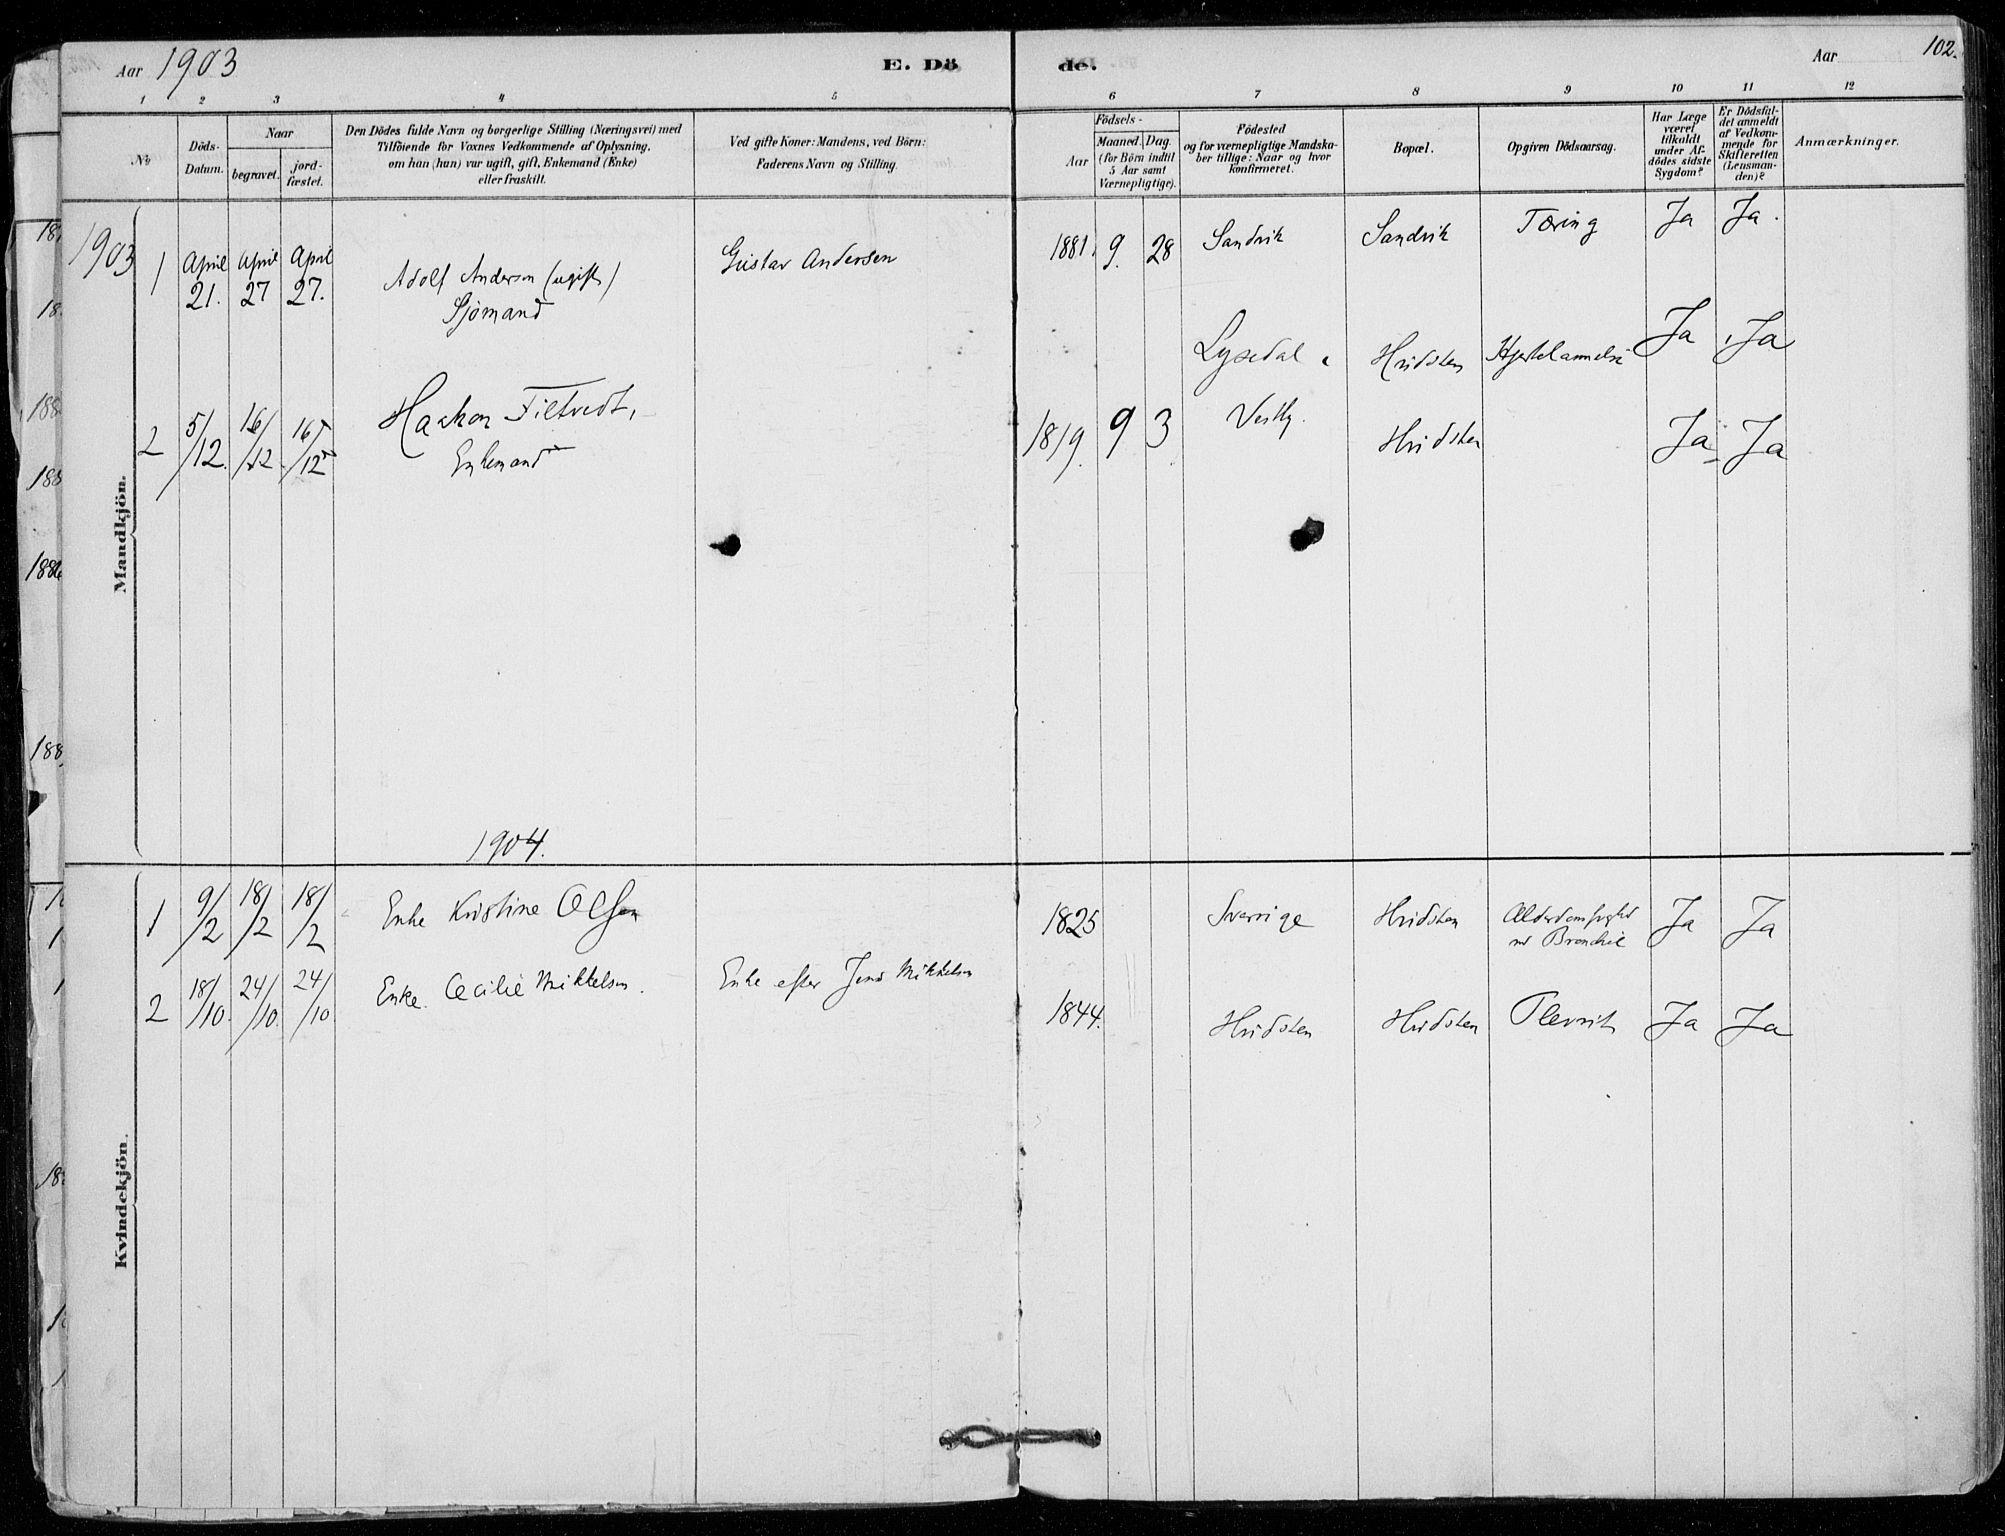 SAO, Vestby prestekontor Kirkebøker, F/Fd/L0001: Ministerialbok nr. IV 1, 1878-1945, s. 102